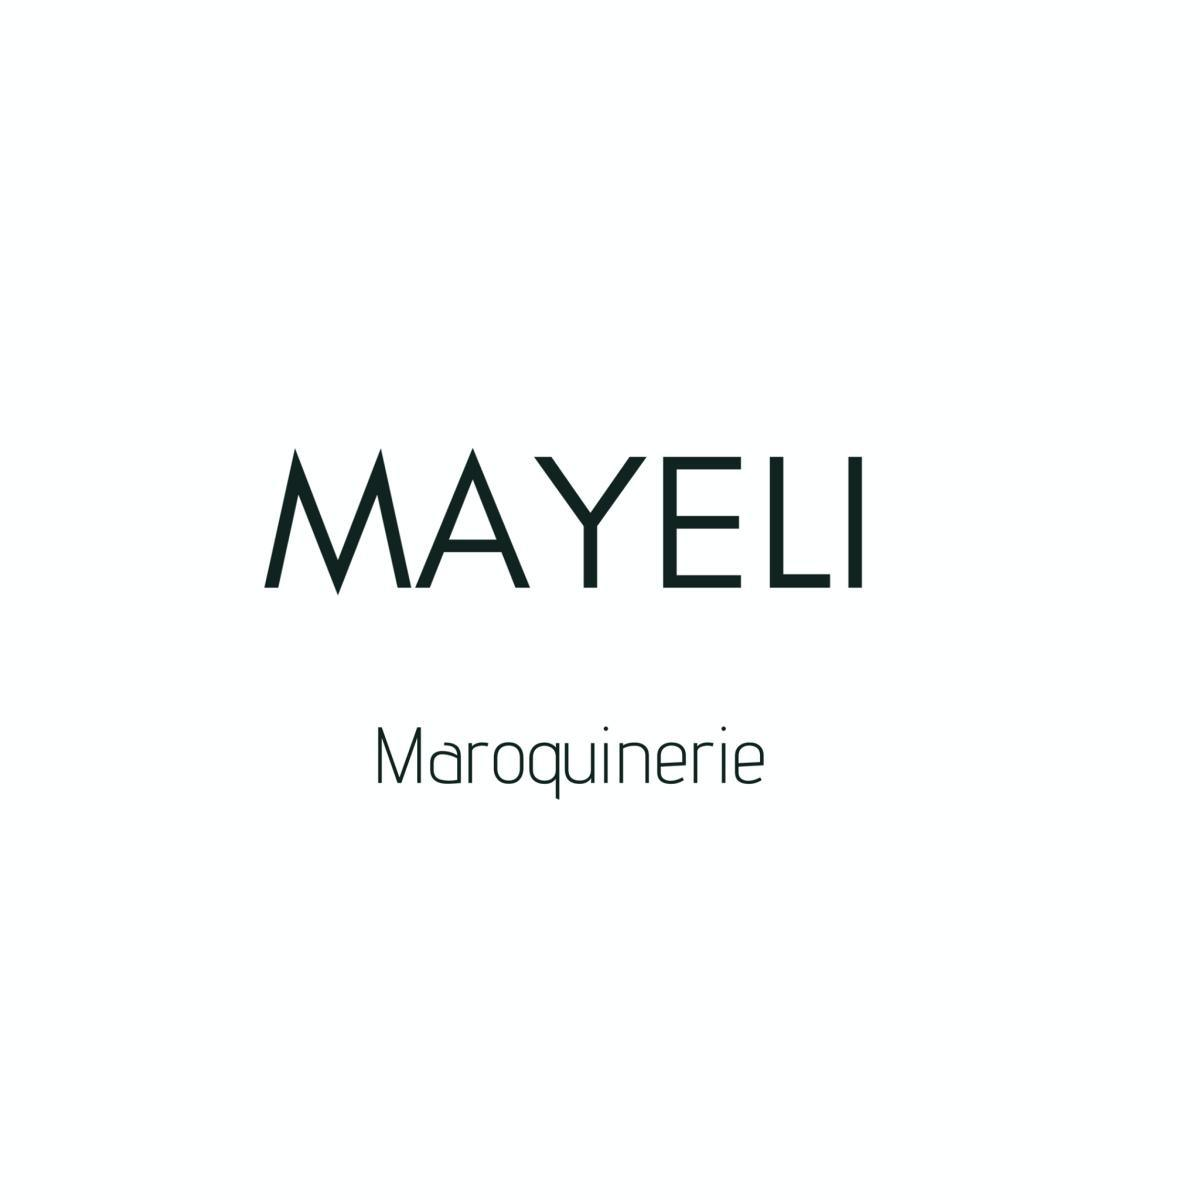 Mayeli Maroquinerie